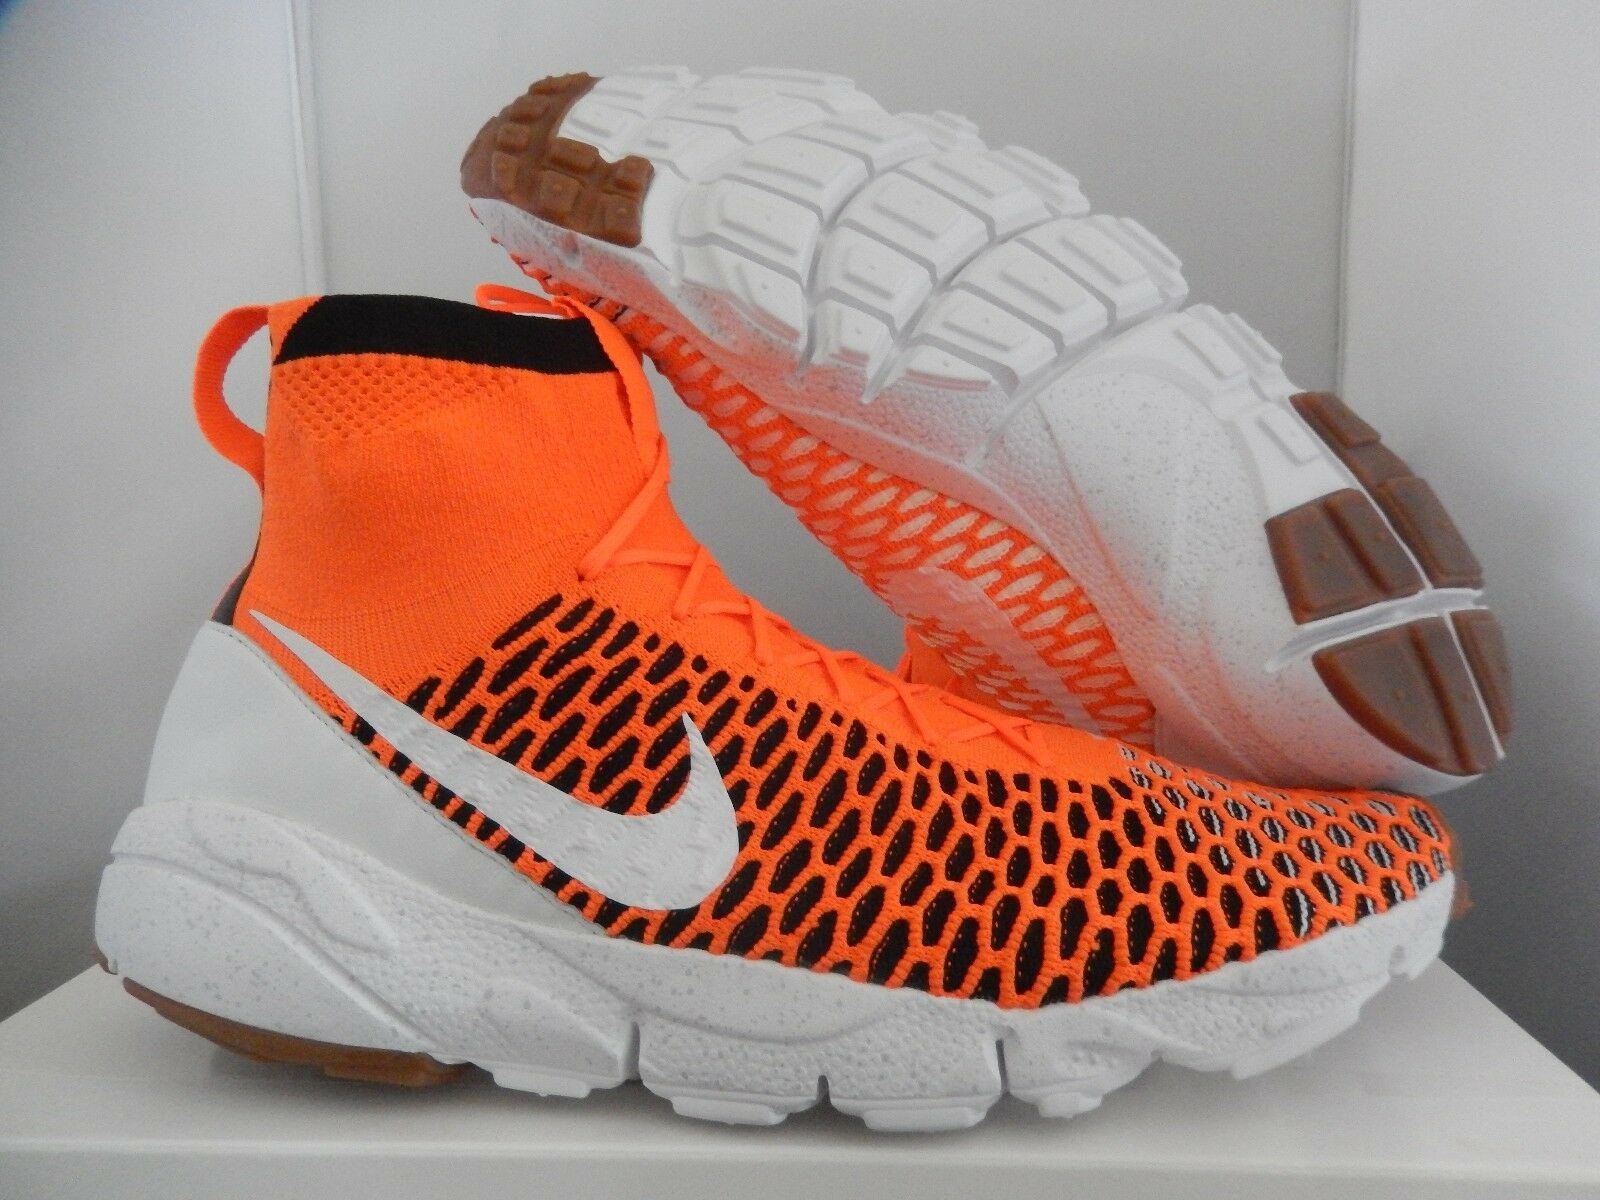 Nike air footscape sz magista sp insgesamt orange-Weiß-schwarz sz footscape 11,5 [652960-800] d41a18